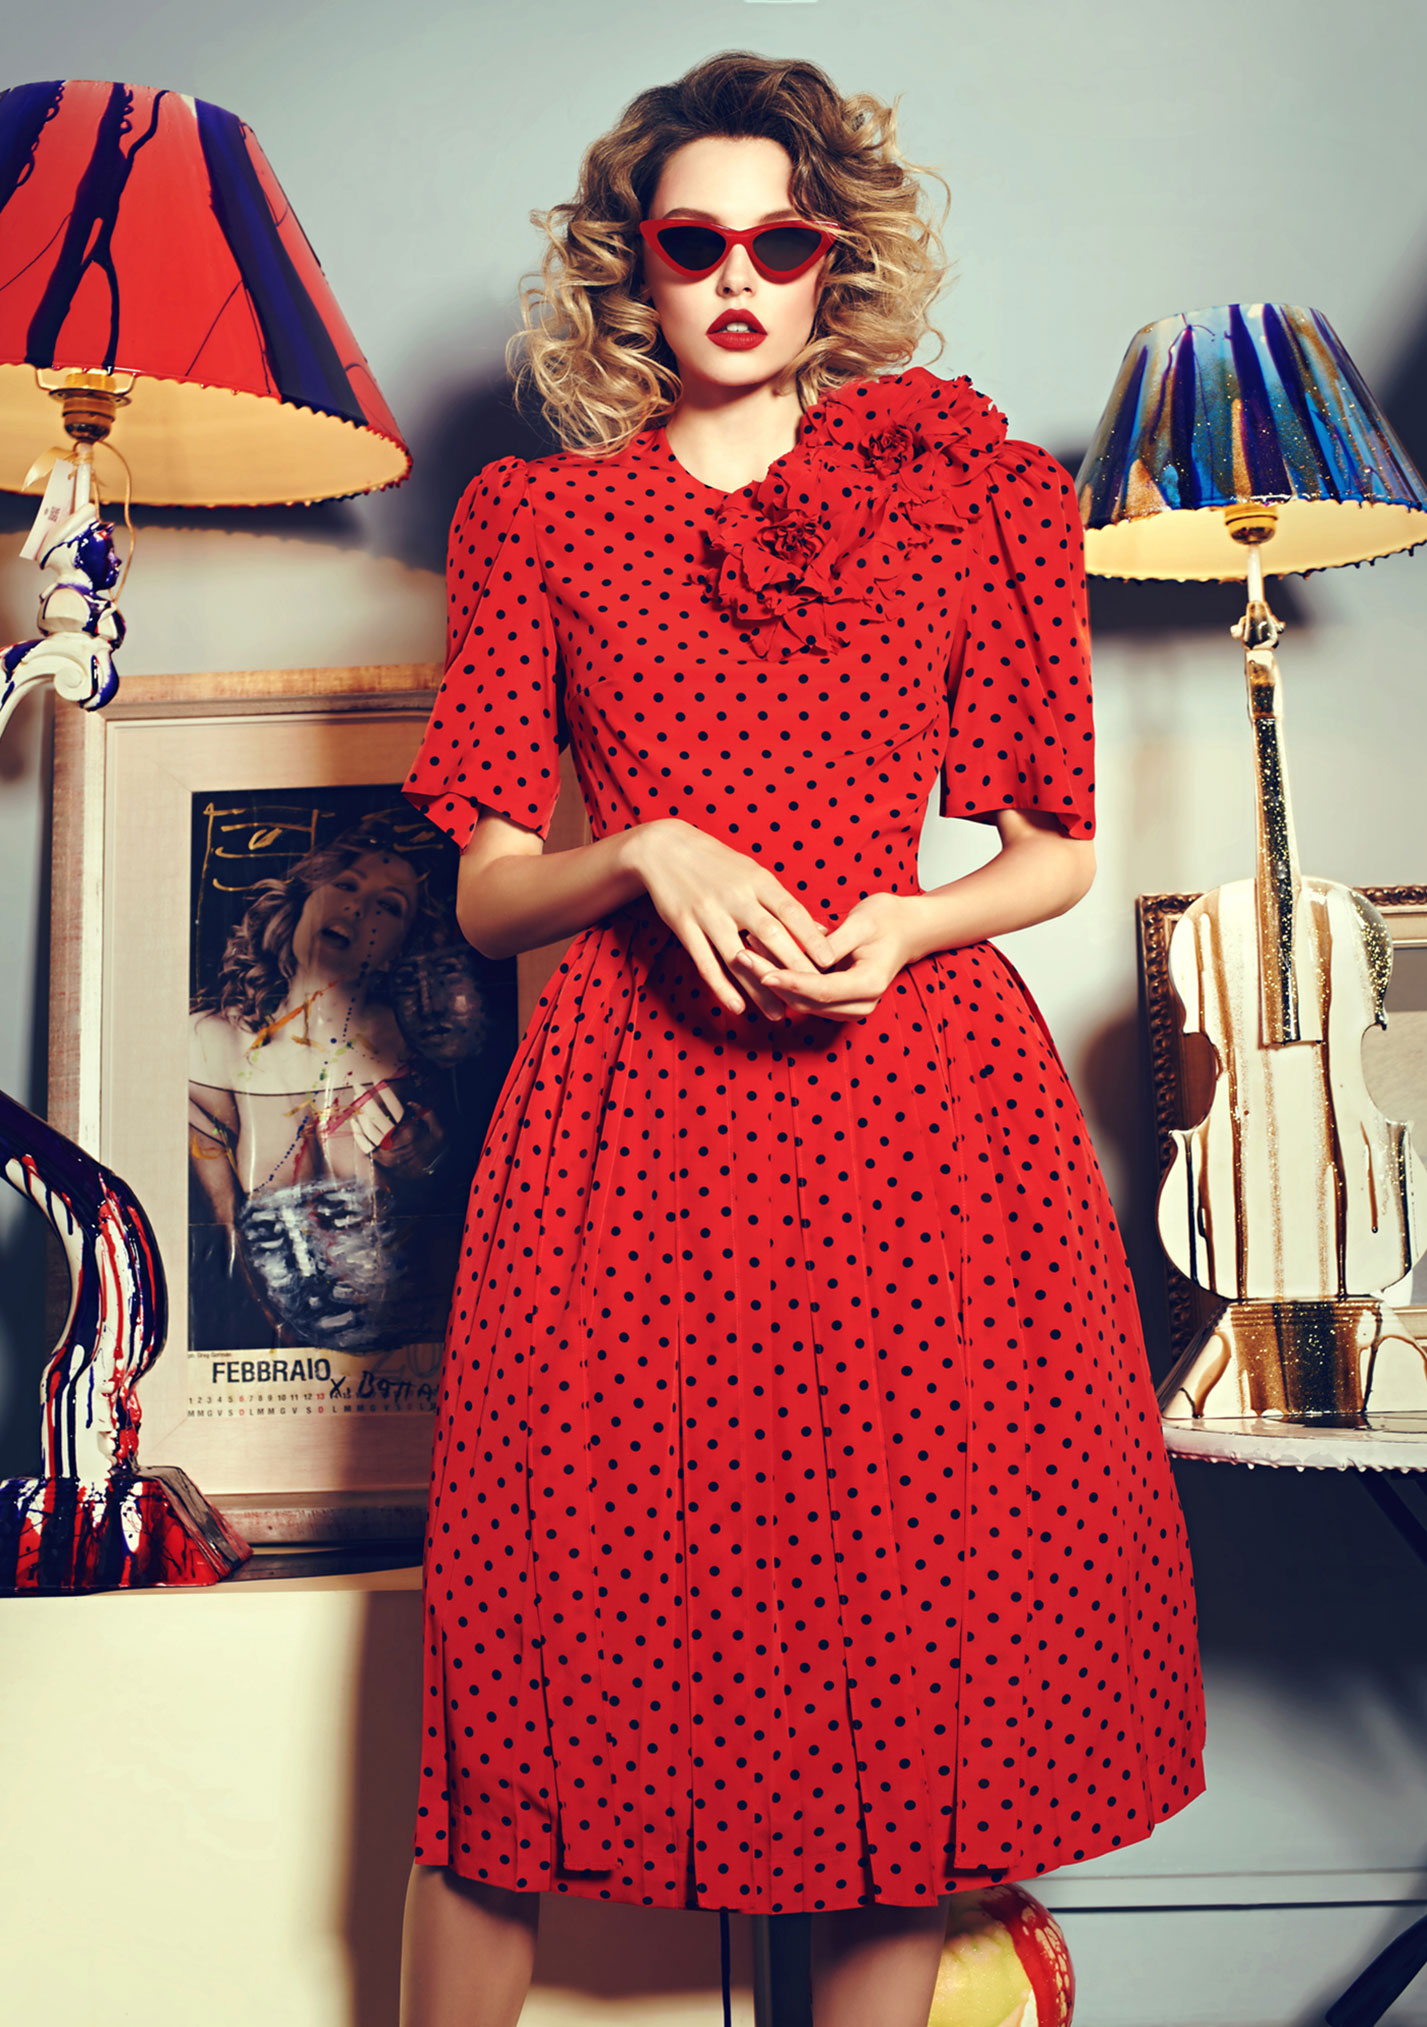 Антонина Ермолина в рекламной кампании модного бренда Au Pont Rouge, весна-лето 2017 / фото 05